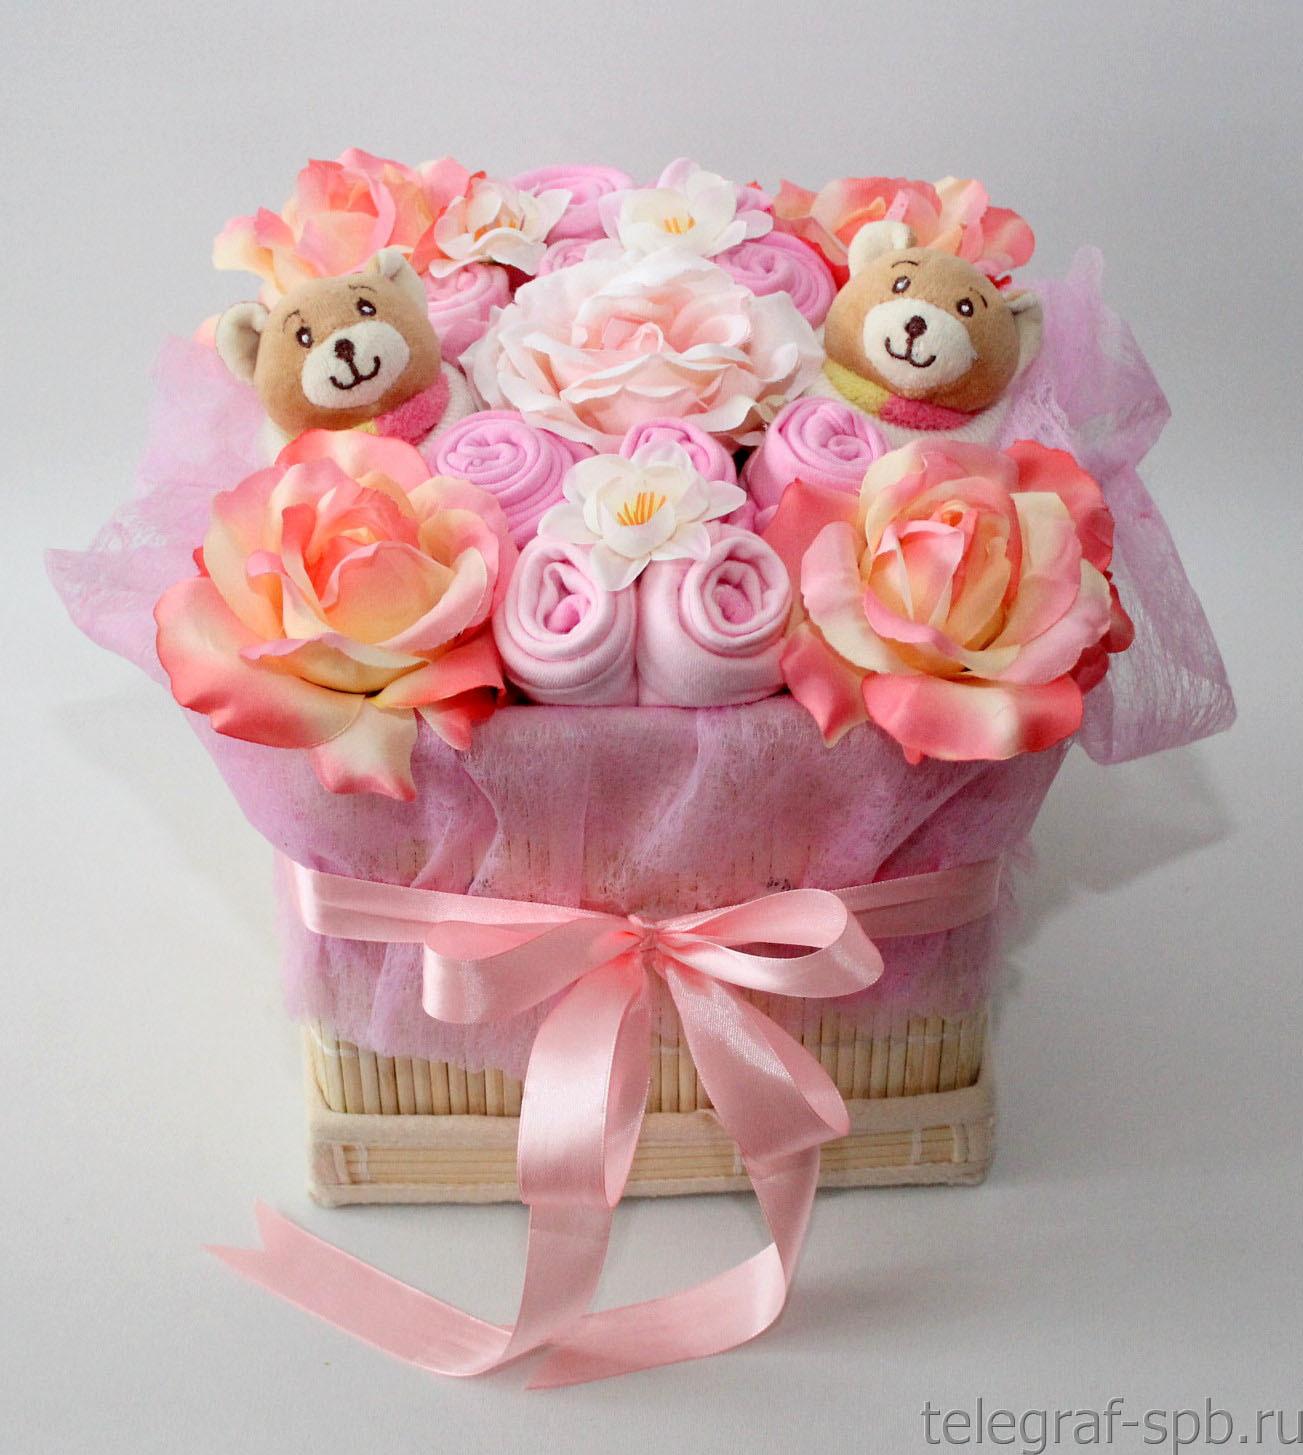 Фото подарок для дочери